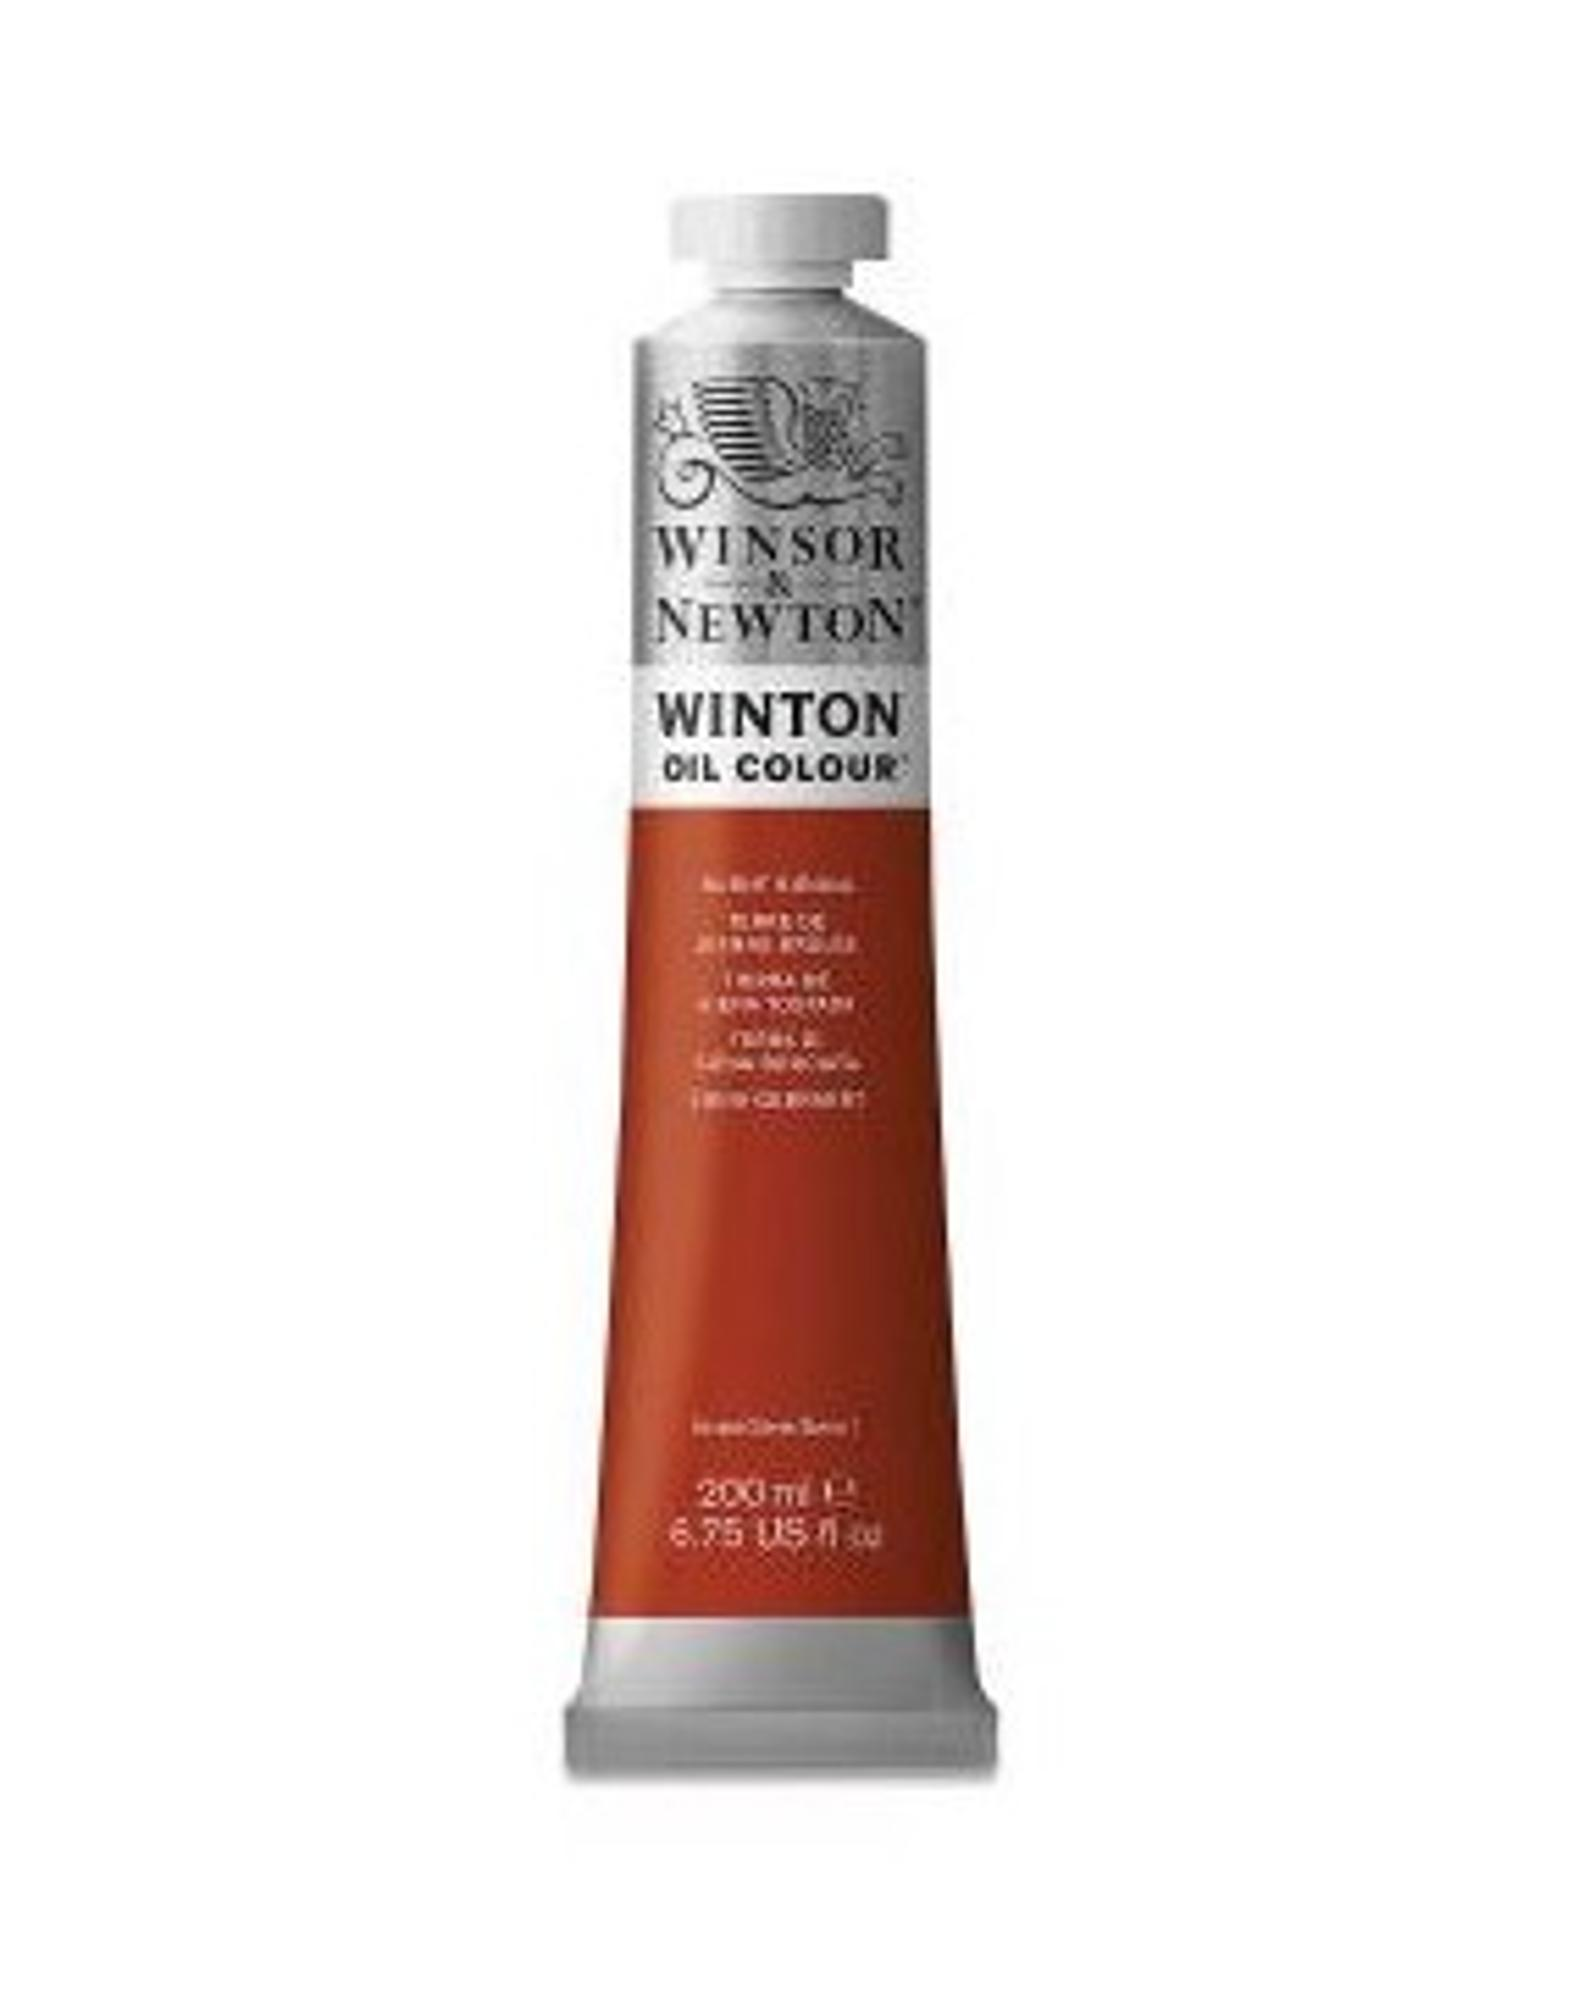 image of: Winsor & Newton Winton Oil Colour Paint, 37ml tube, Burnt Sienna